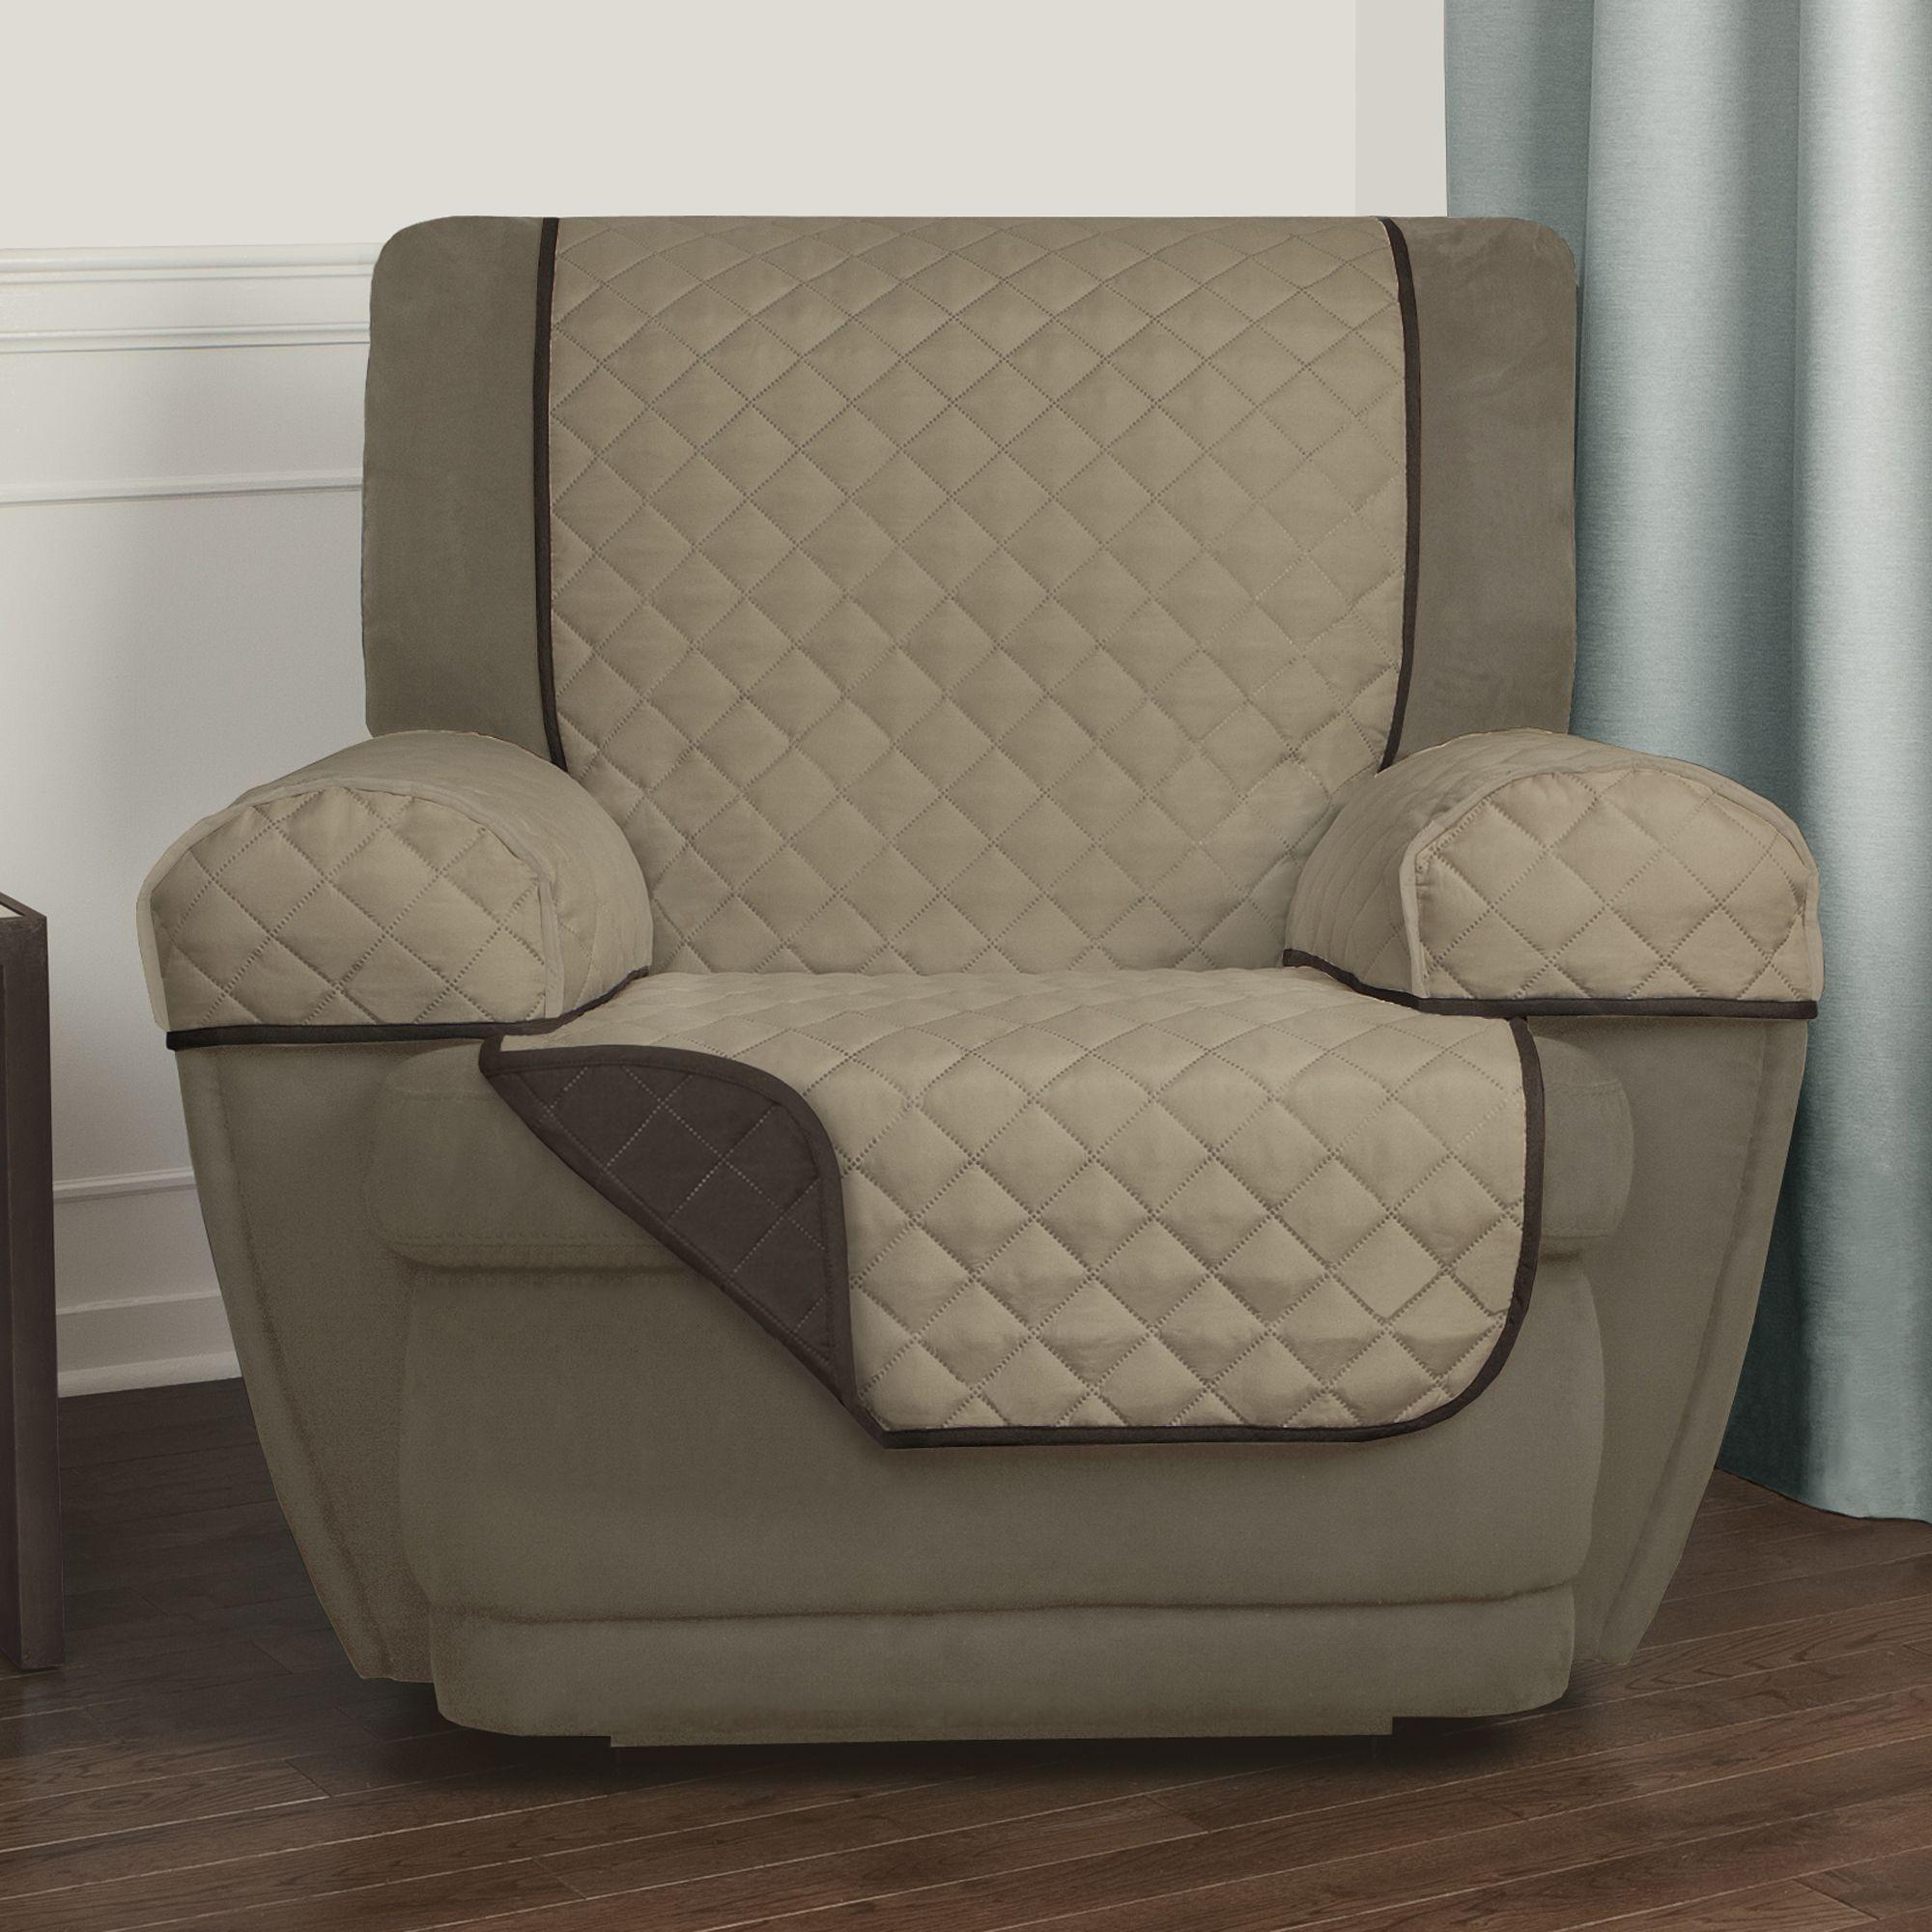 Wondrous Maytex Reversible 3 Piece Microfiber Recliner Pet Cover Alphanode Cool Chair Designs And Ideas Alphanodeonline